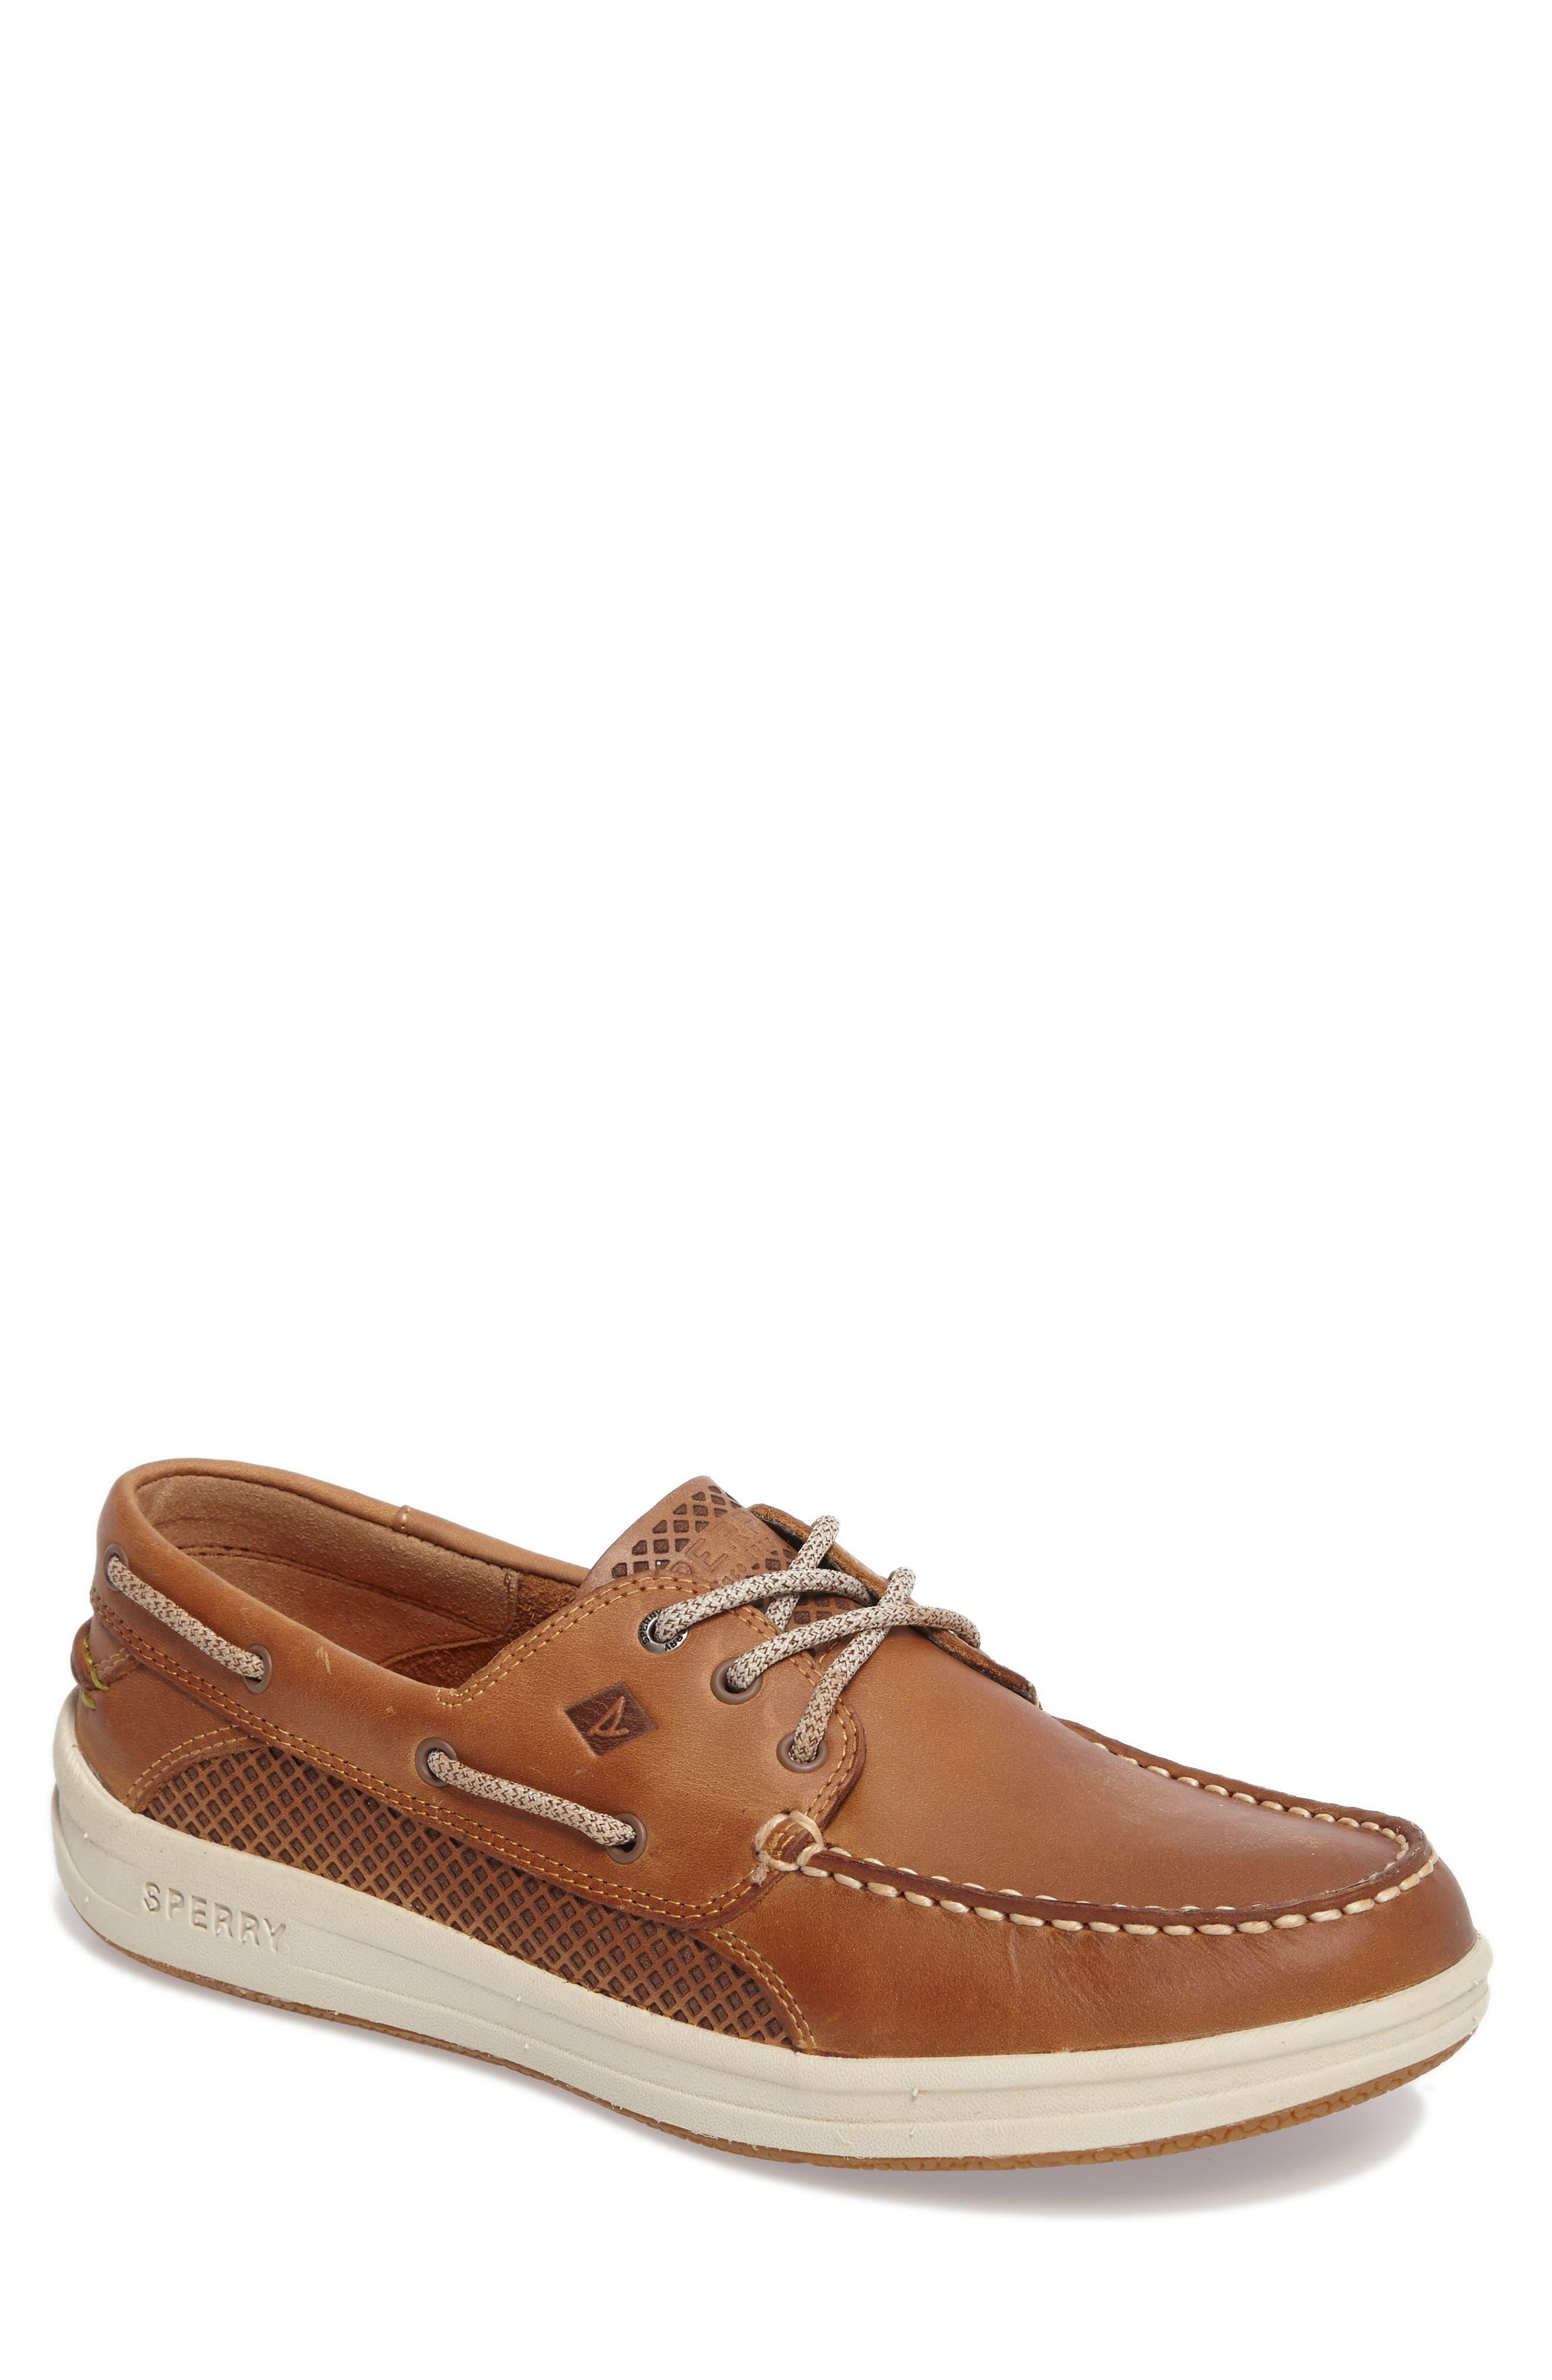 Gamefish Boat Shoe,                         Main,                         color,